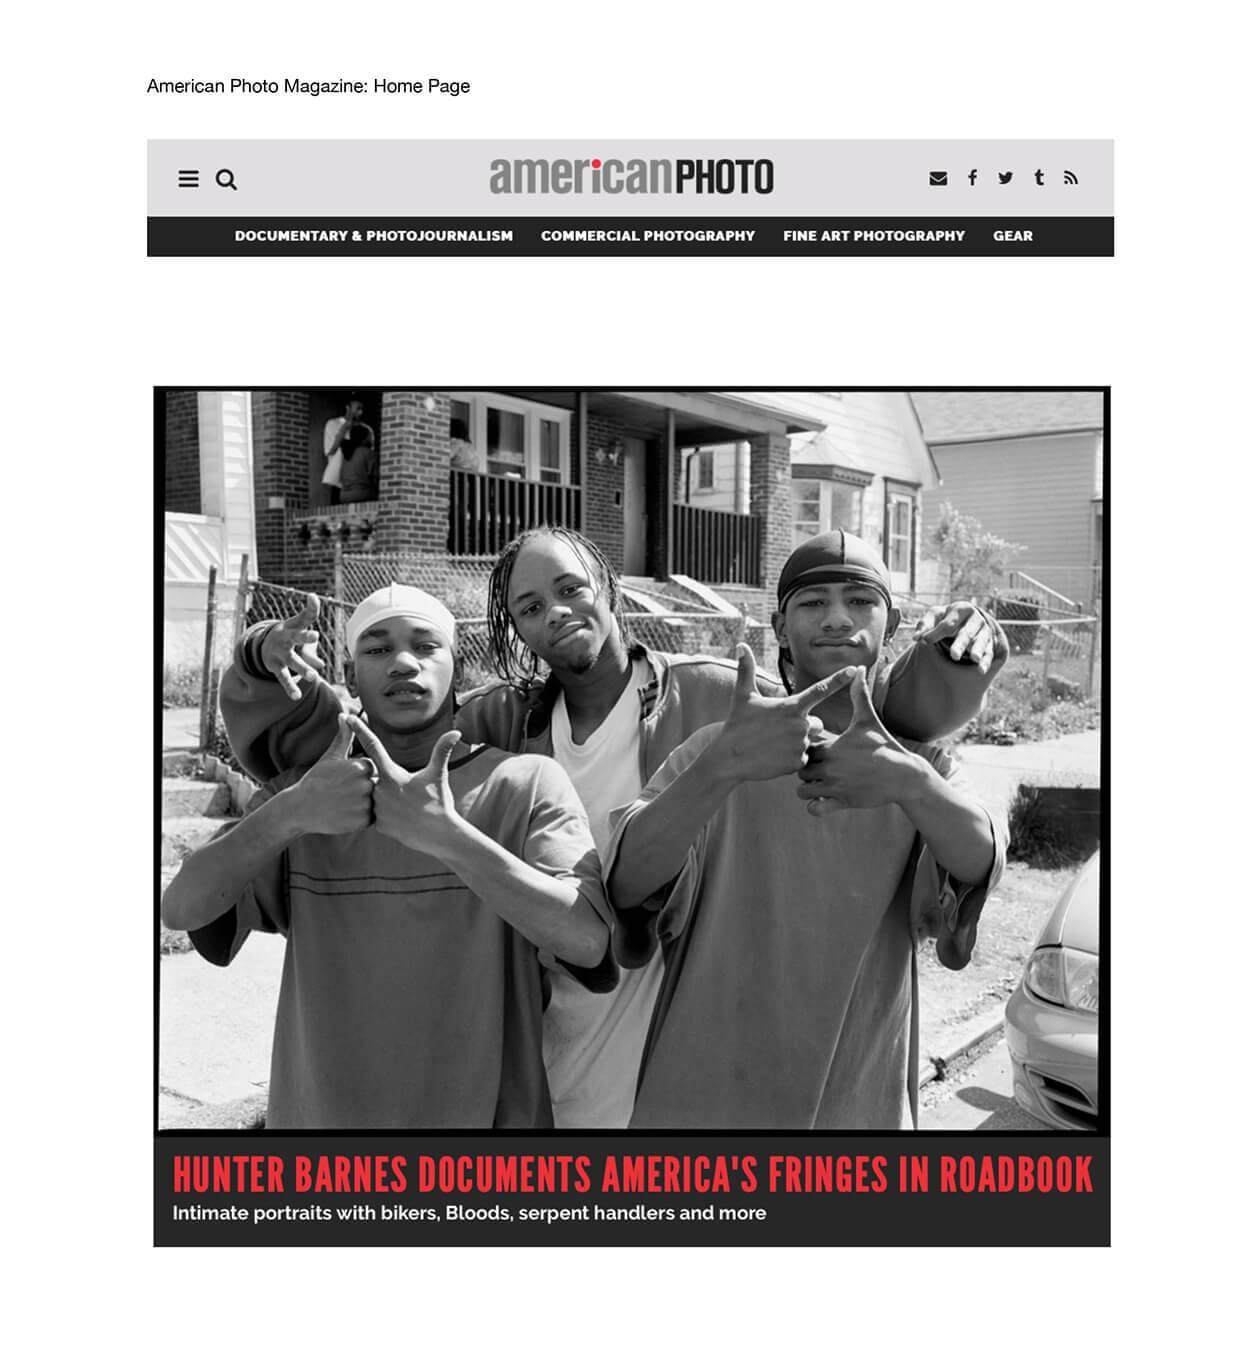 Hunter Barnes documents America's fringe communities in Roadbook - American Photo - Page 1